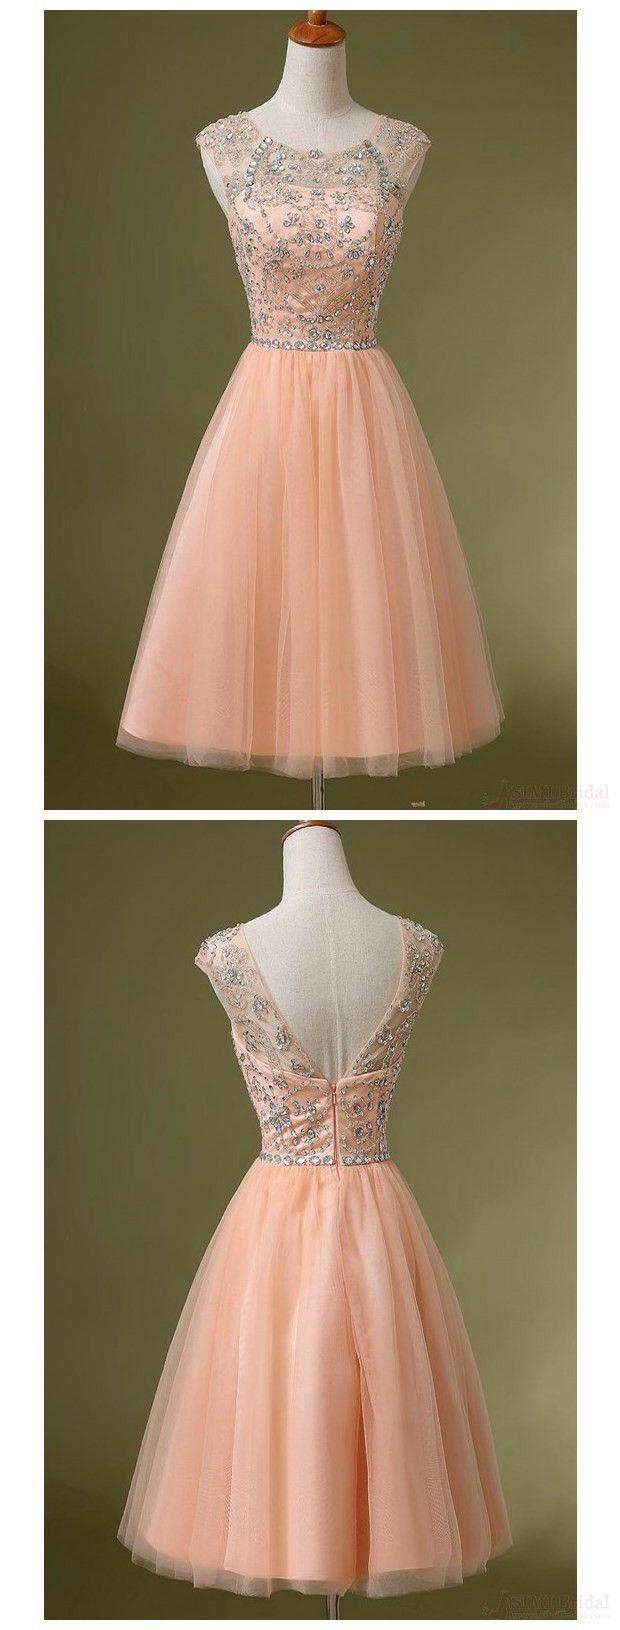 short prom dress,cocktail dresses,homecoming dresses#promdresses #simibridal